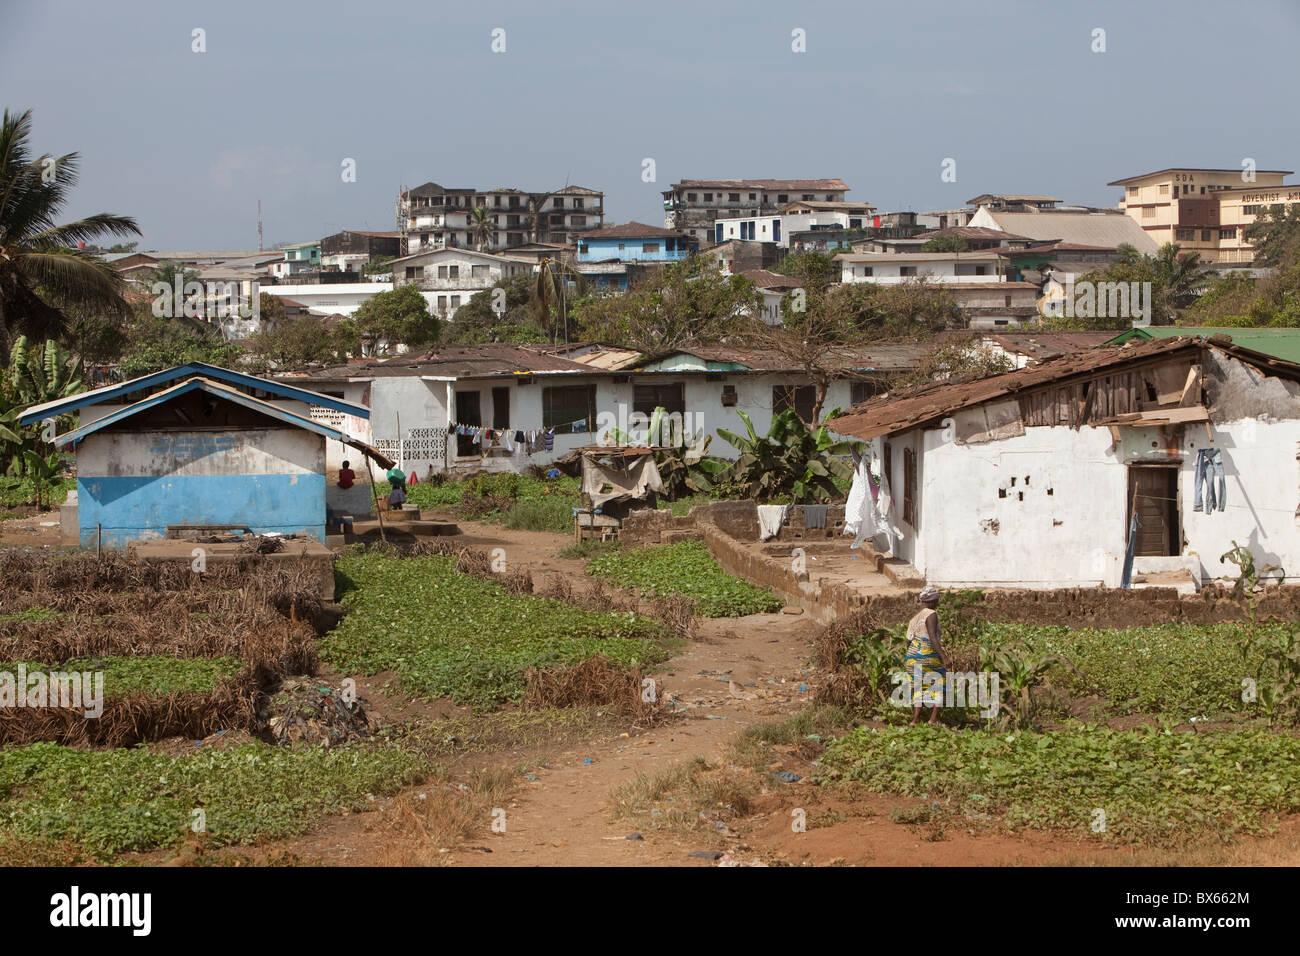 City scene along oceanfront   Monrovia, Liberia, West Africa. - Stock Image